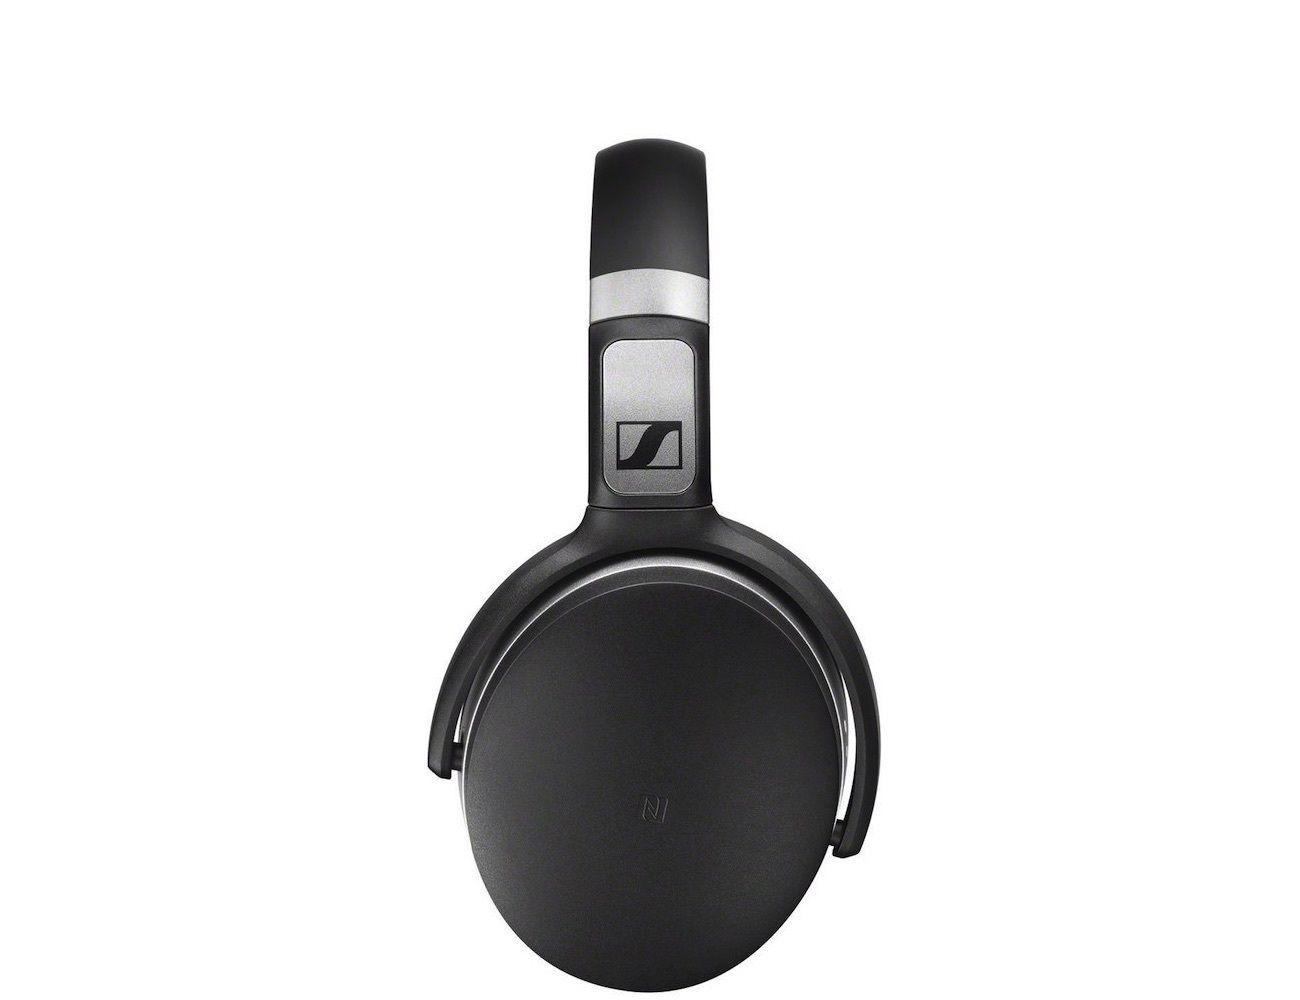 Sennheiser HD 4.50 Wireless Headset